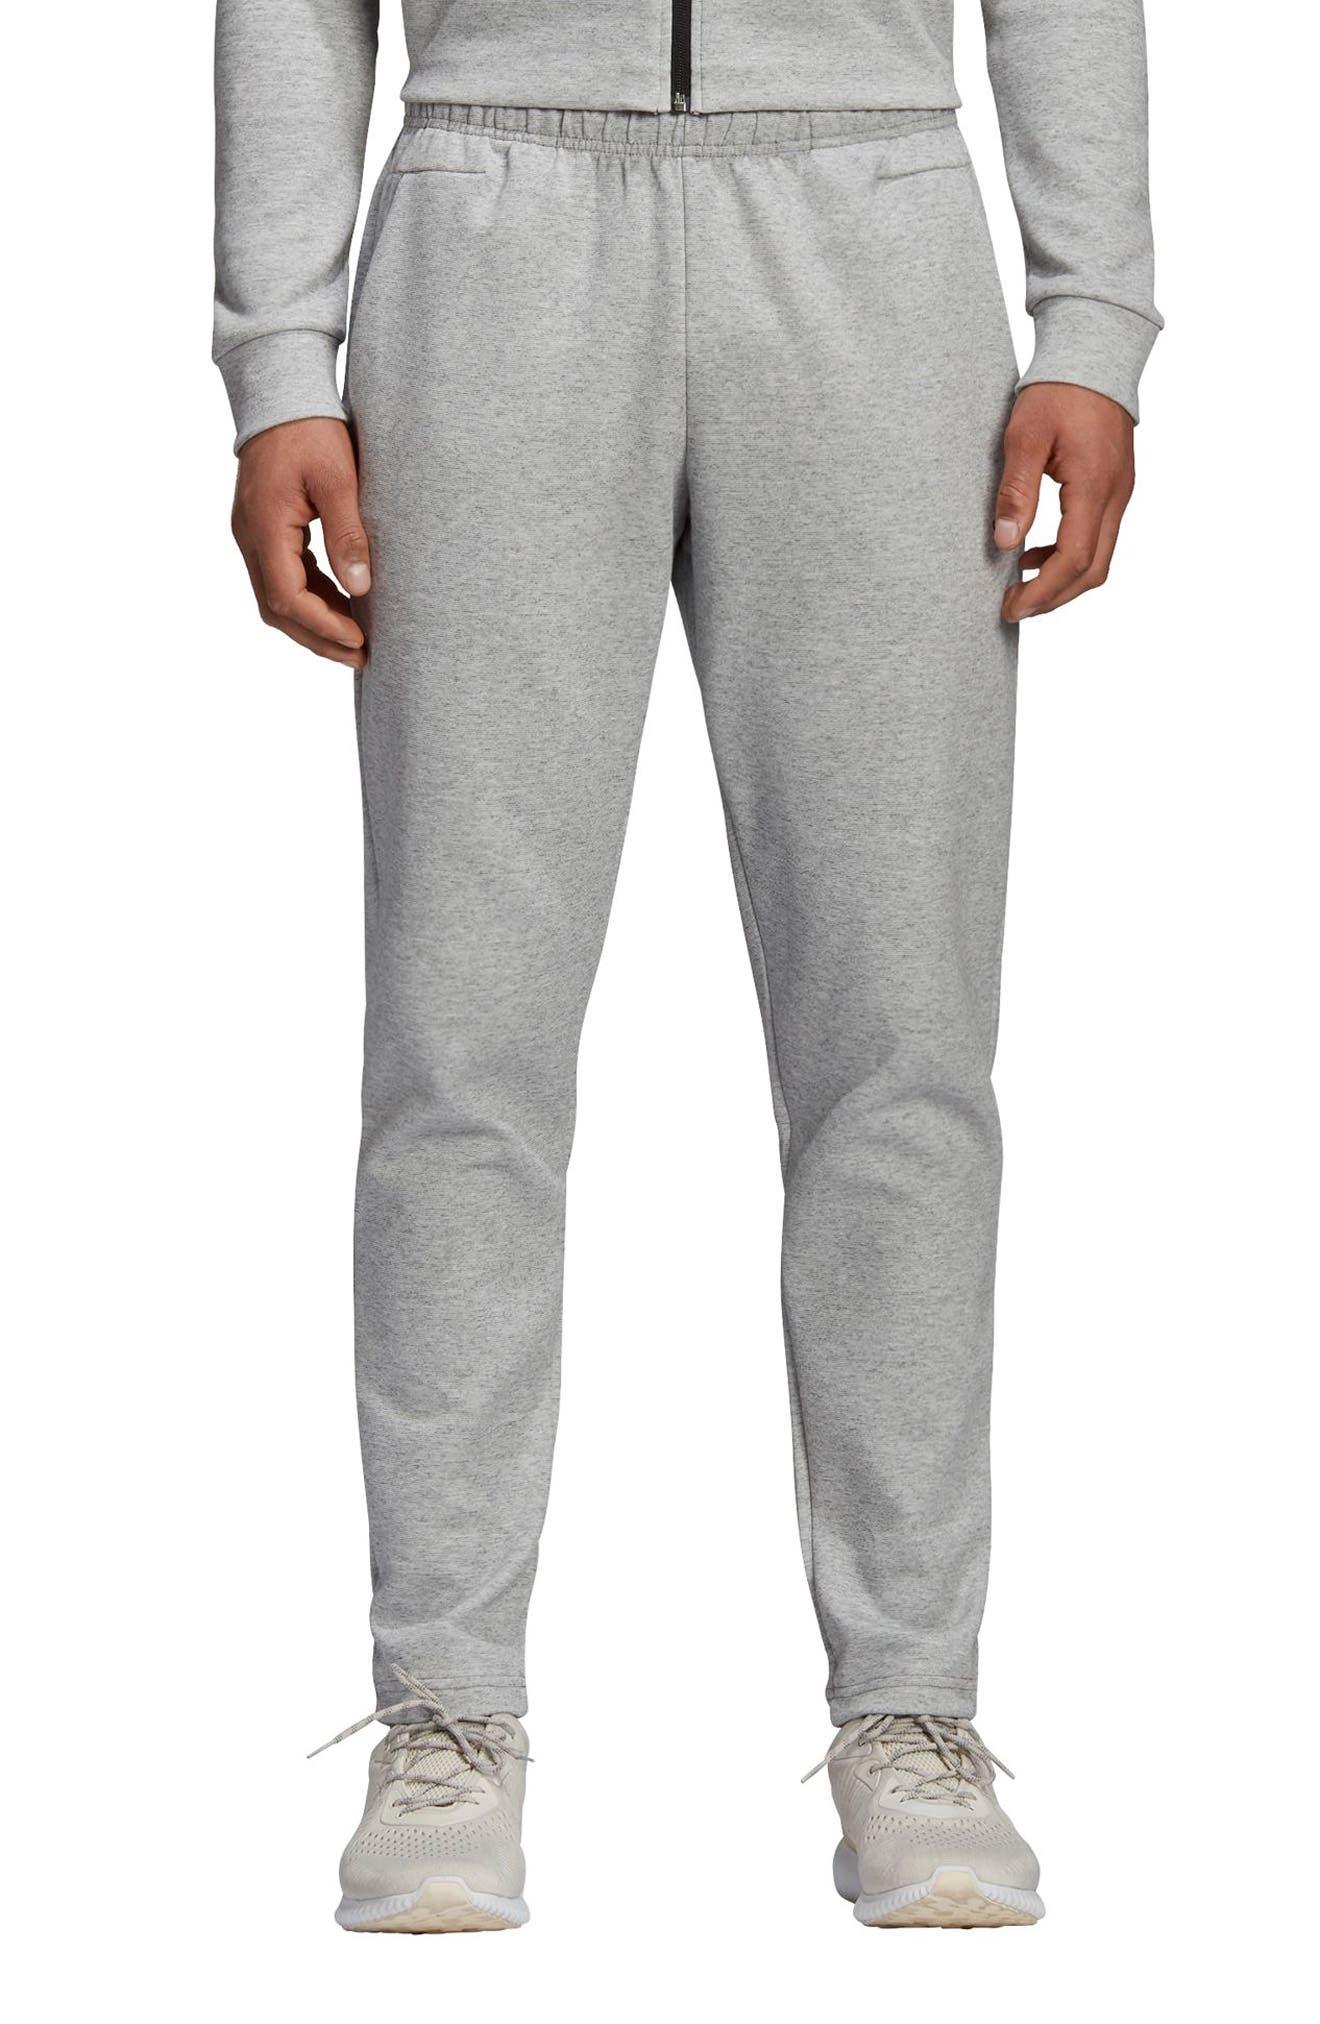 ID Stadium Knit Pants,                         Main,                         color, Stadium Htr/ Grey